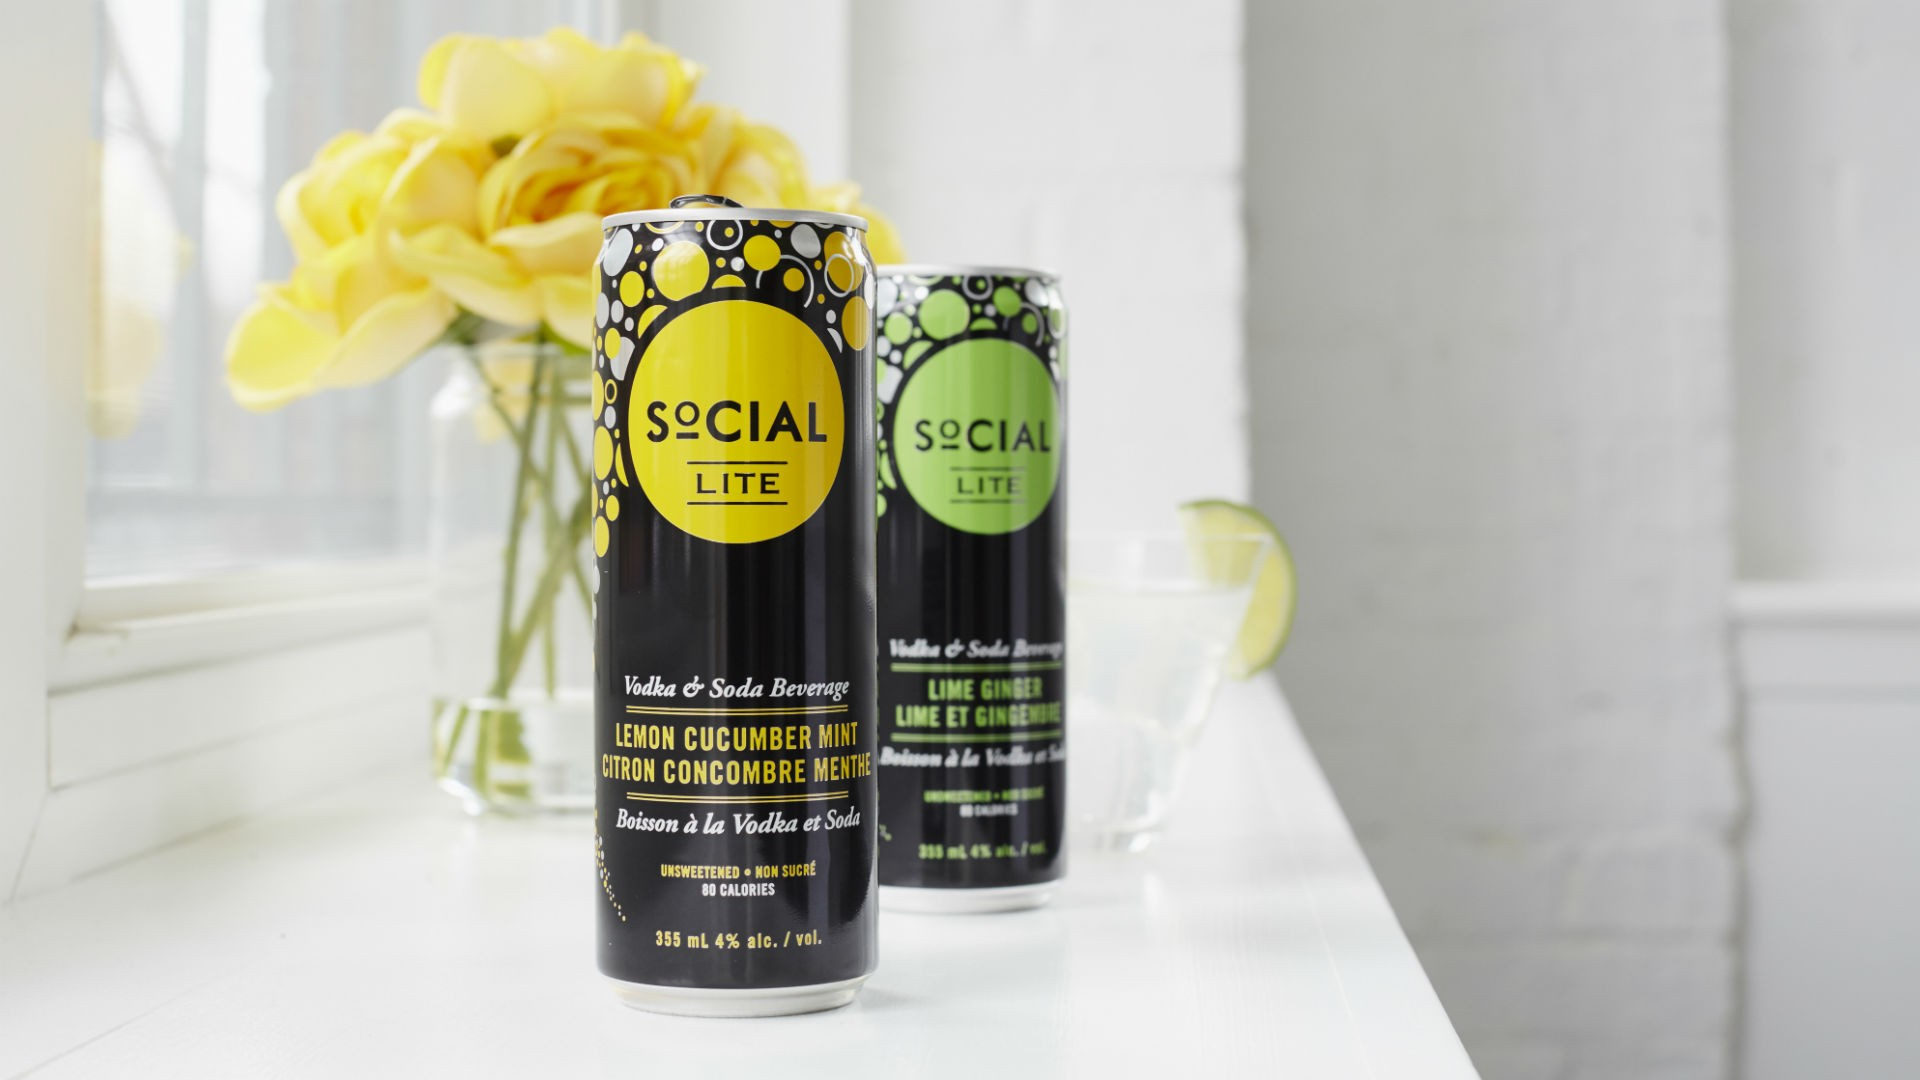 Hard seltzers and sodas | Social Lite Vodka Sodas